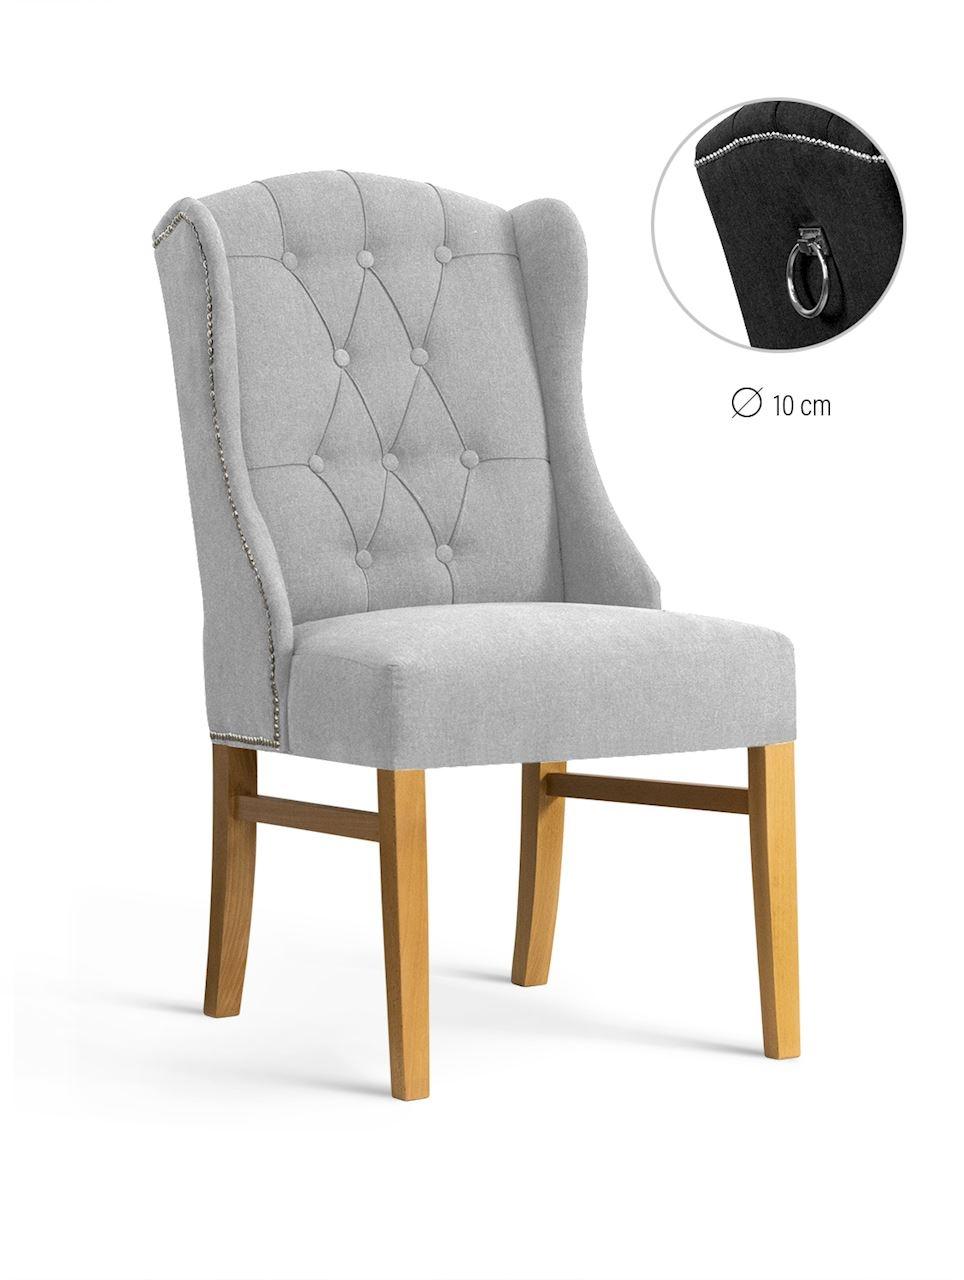 Scaun tapitat cu stofa, cu picioare din lemn Royal Light Grey / Oak, l55xA74xH105 cm somproduct.ro